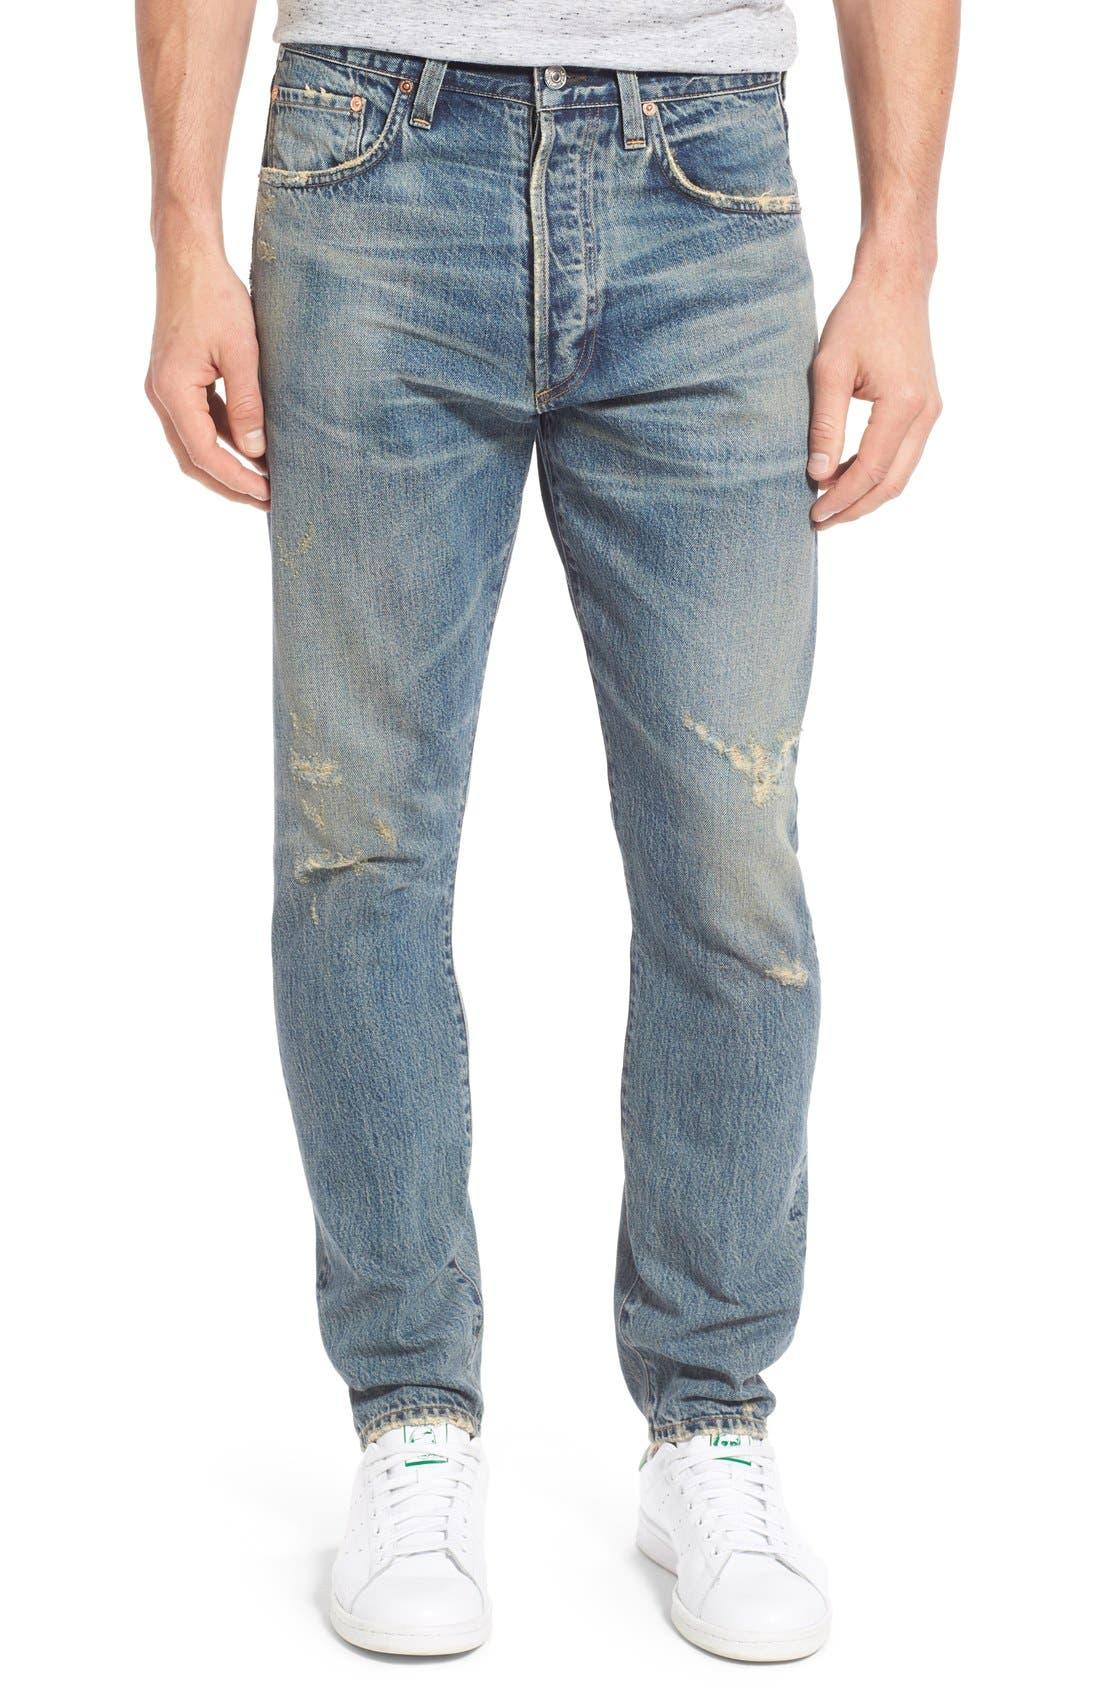 Rowan Slouchy Skinny Fit Jeans,                             Main thumbnail 1, color,                             462